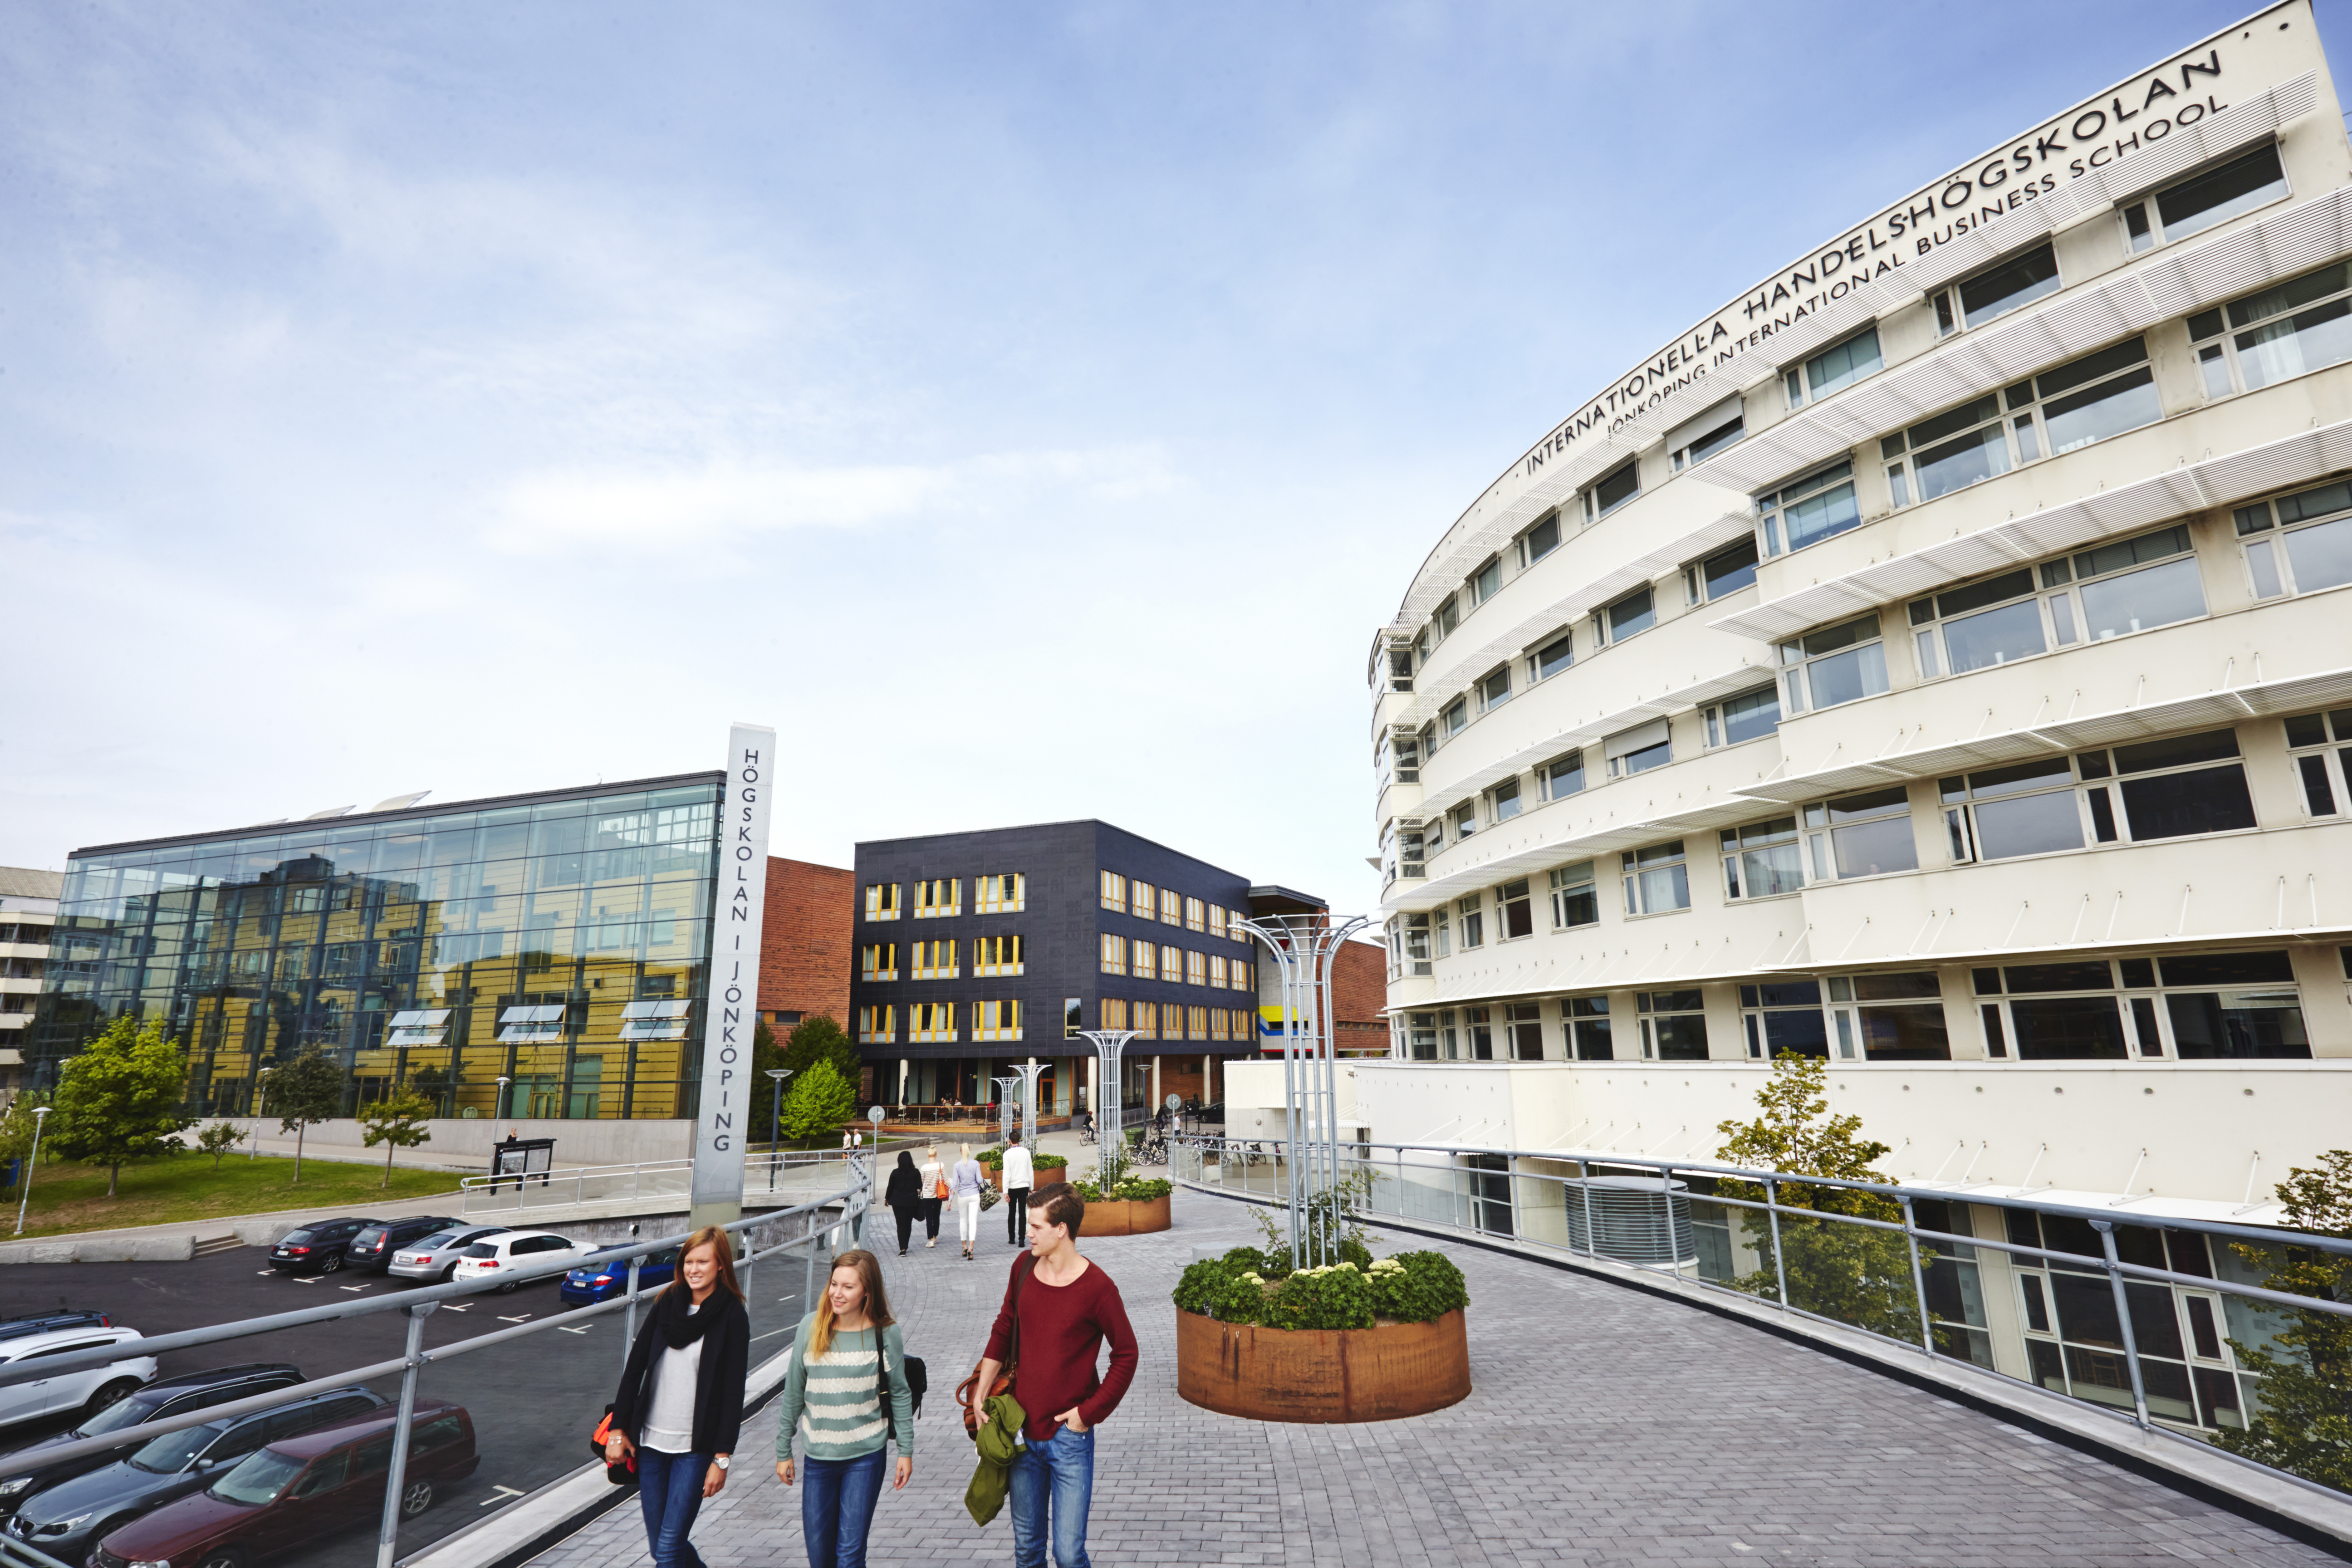 Lighting design student on prestigious list about the university